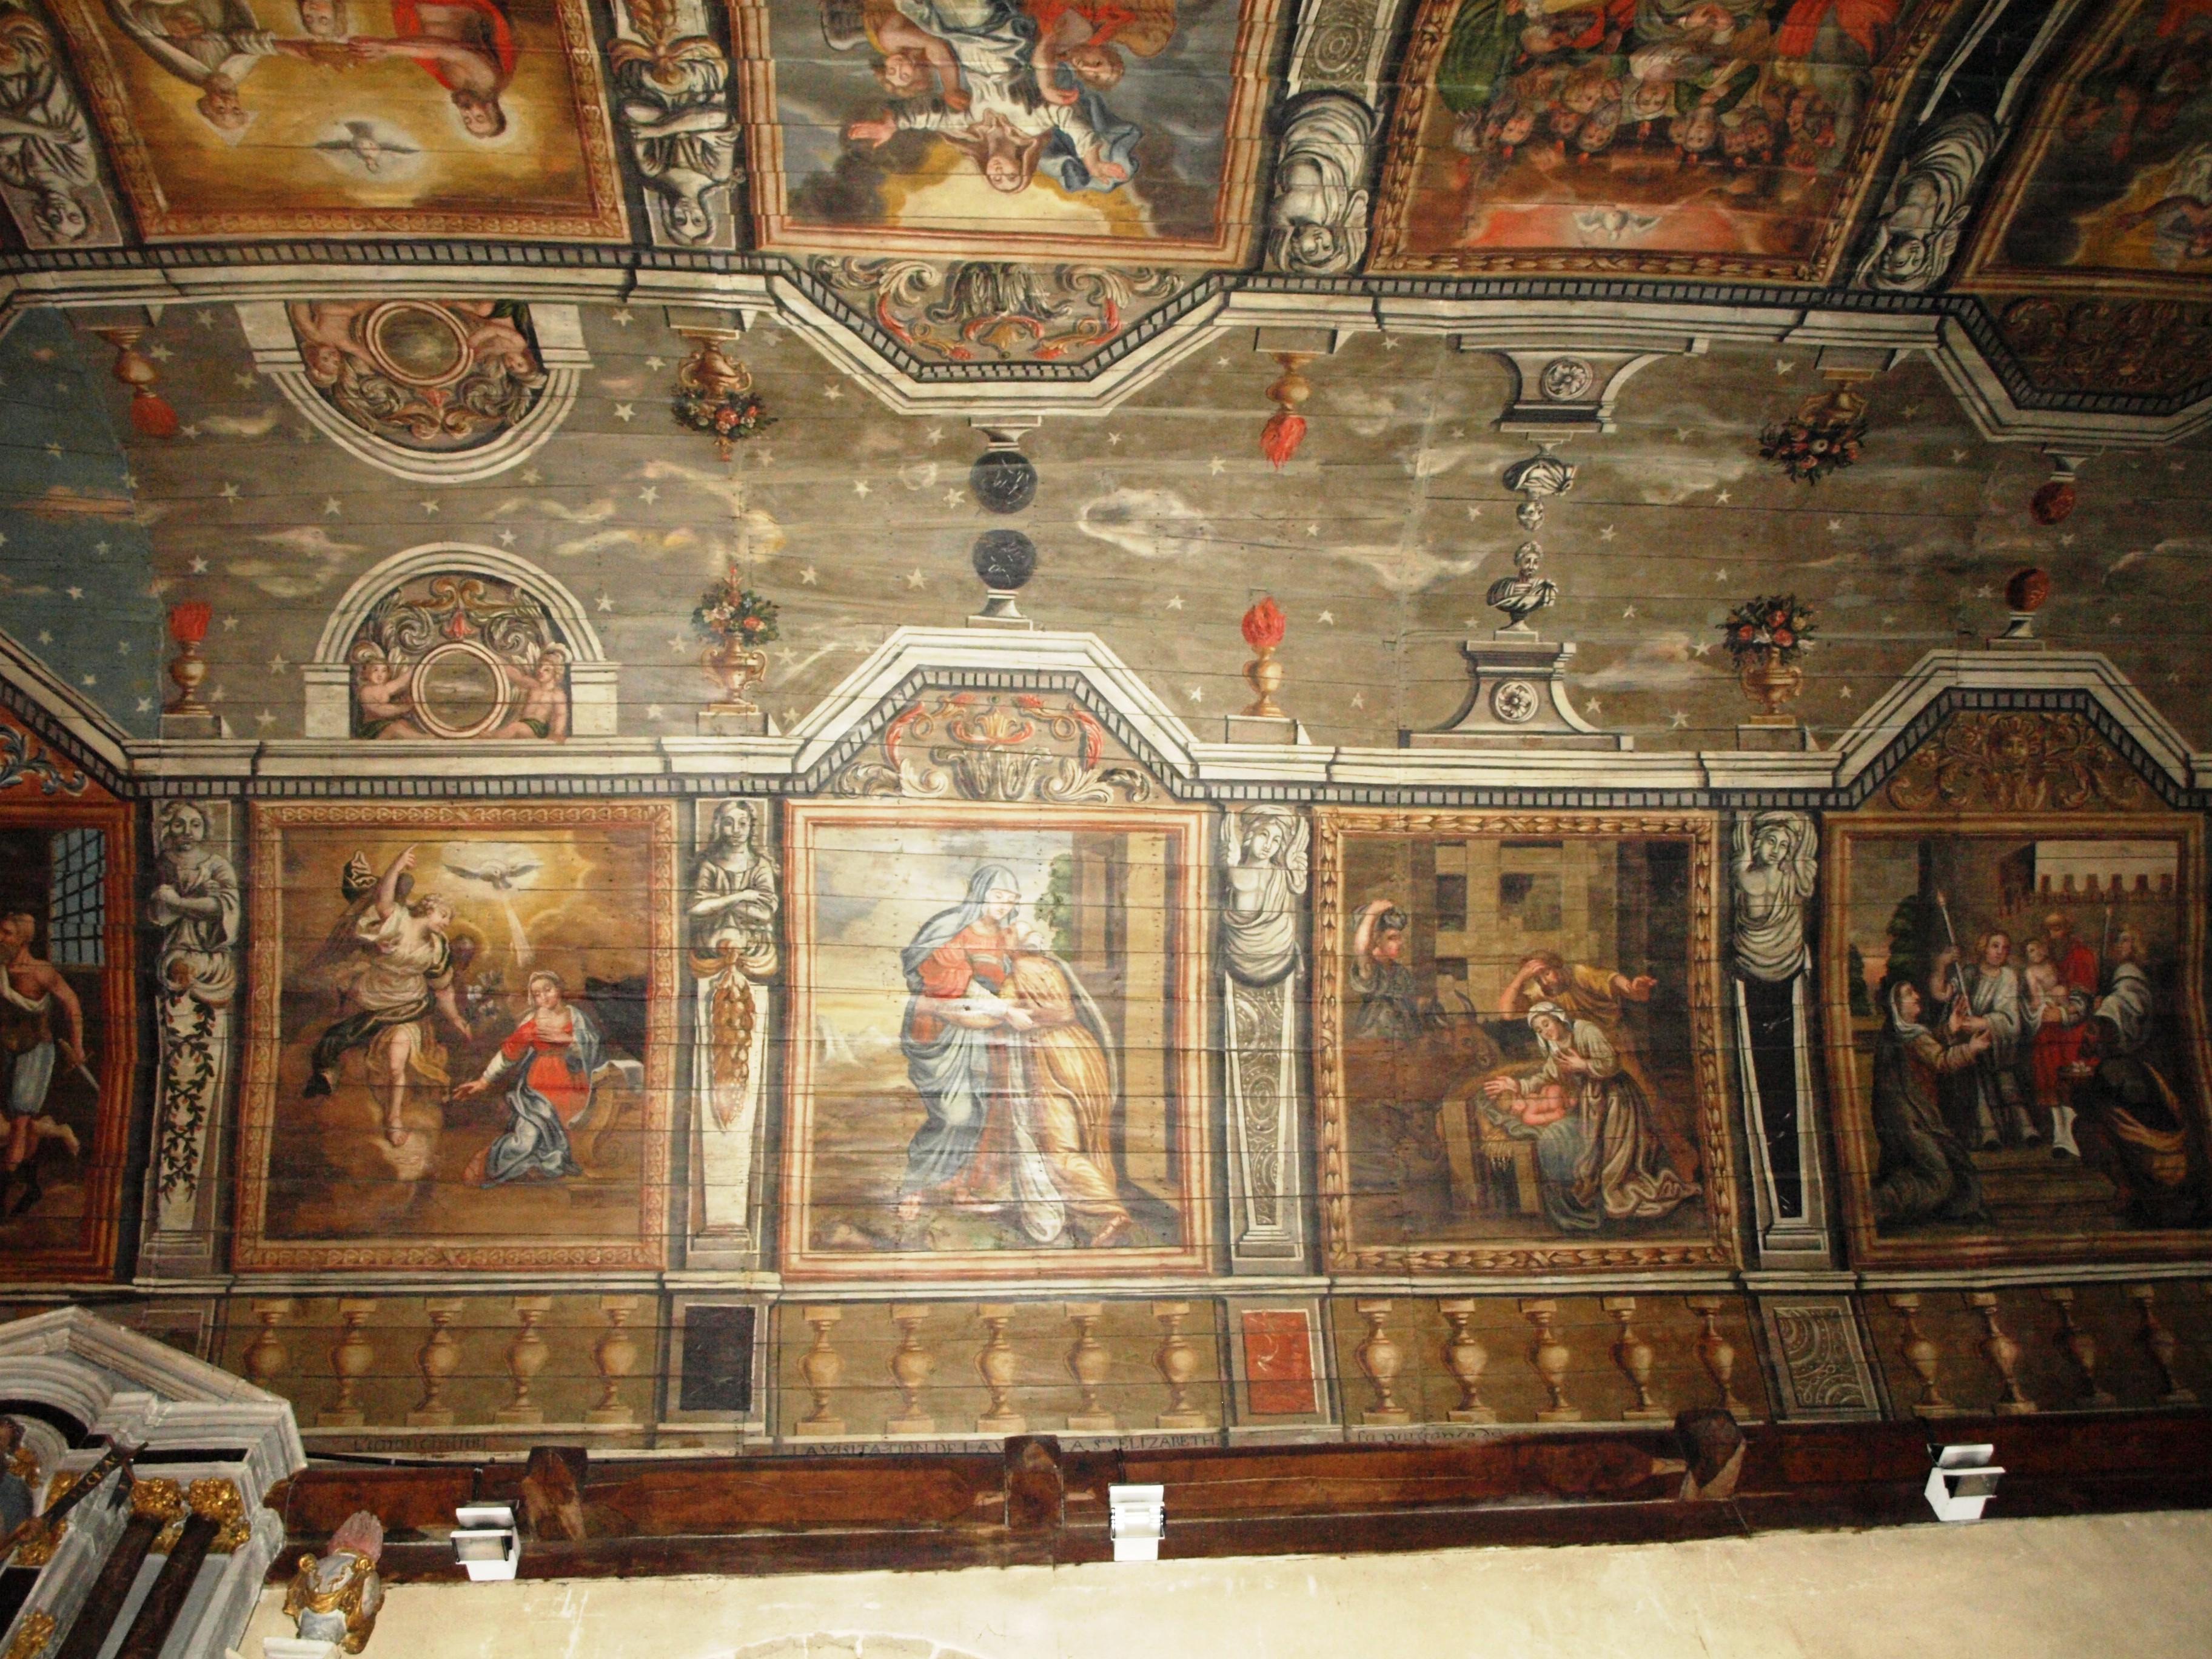 Francie - Bretaň - Carnac, strop kostela je zdoben malovanými výjevy ze života sv.Cornelia